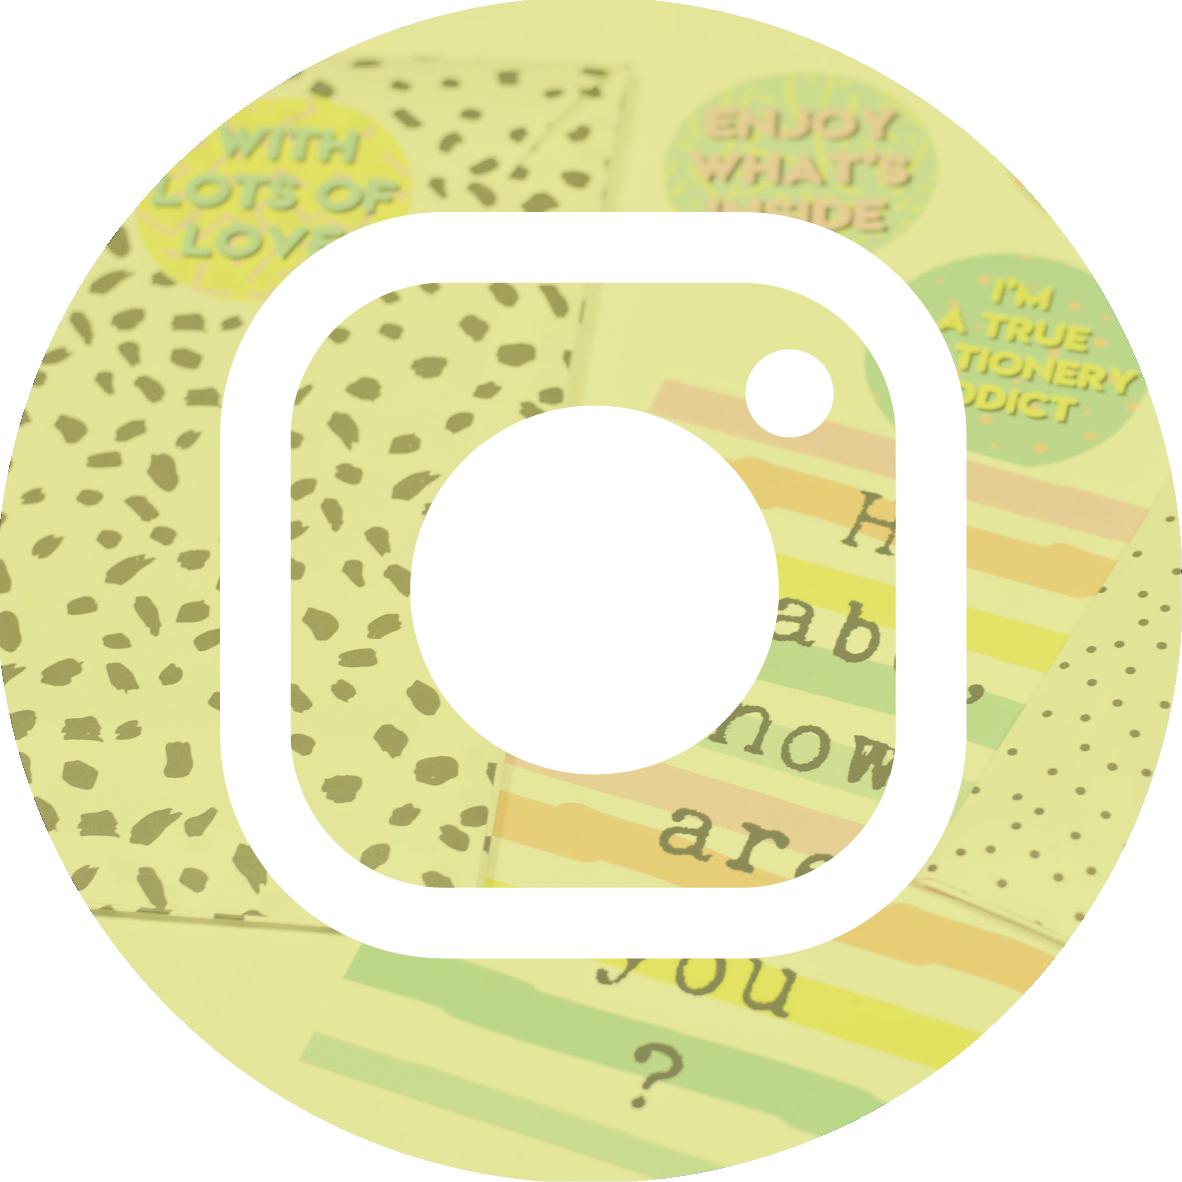 social-icons_tekengebied11617274132